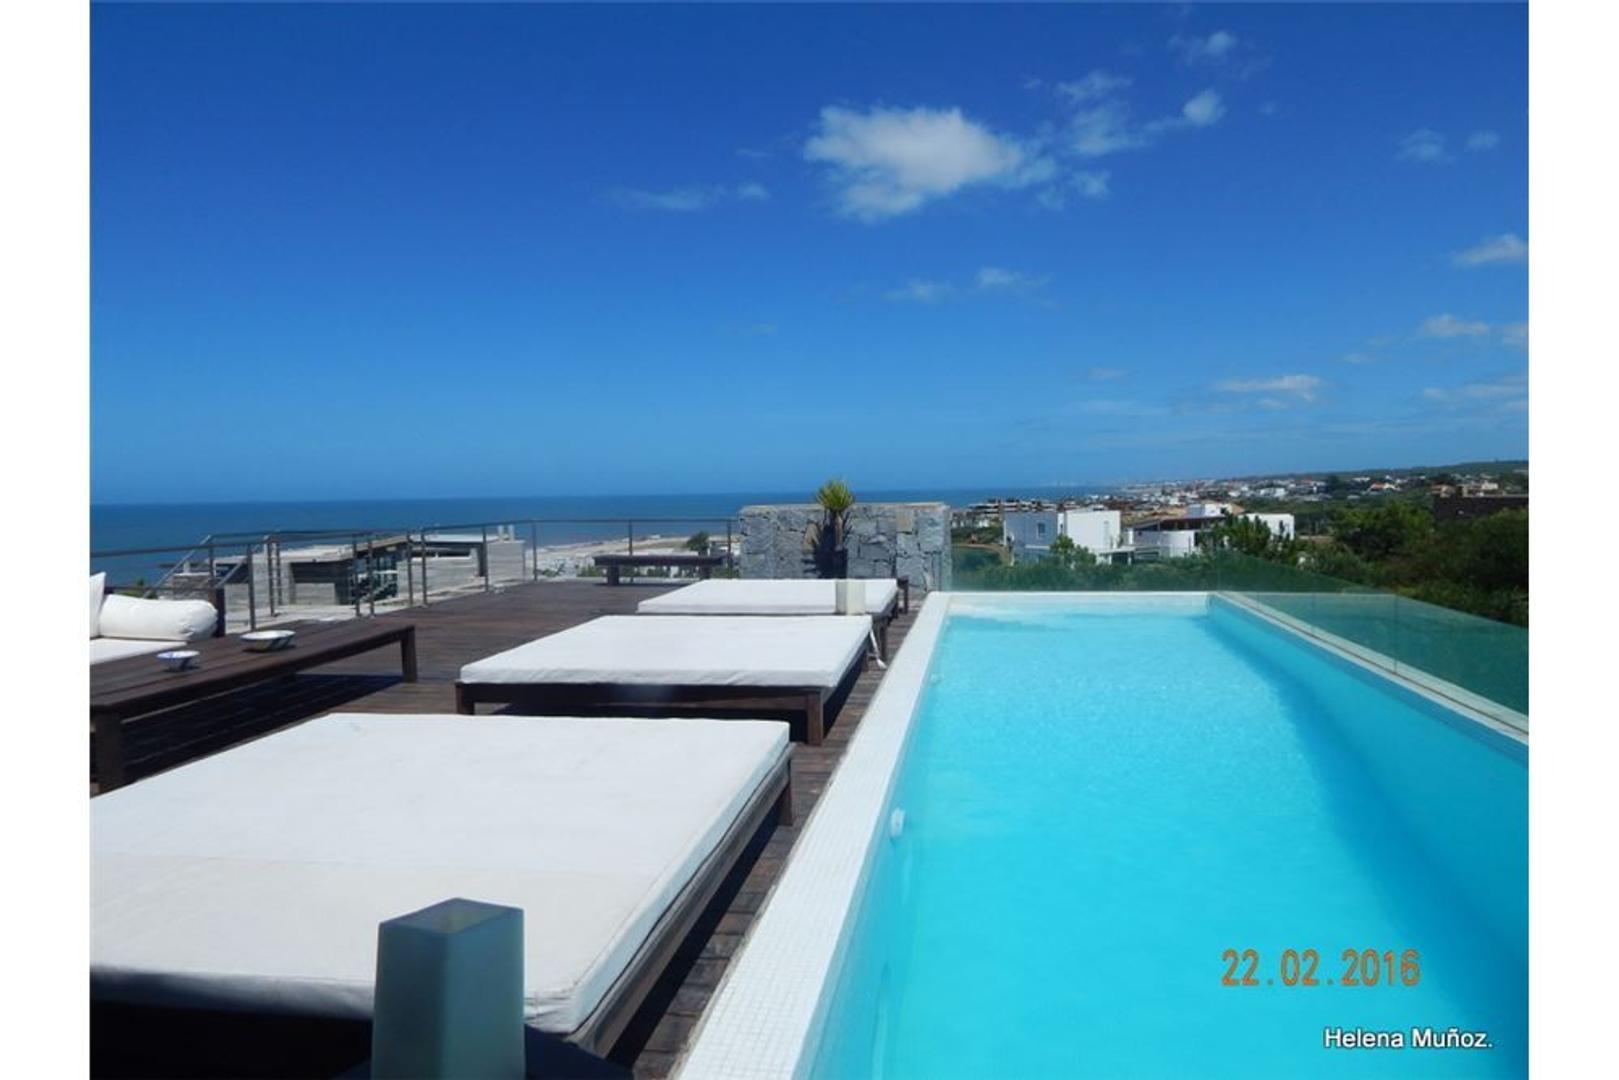 Esplendida vista al mar c/ 7 suites y piscina.